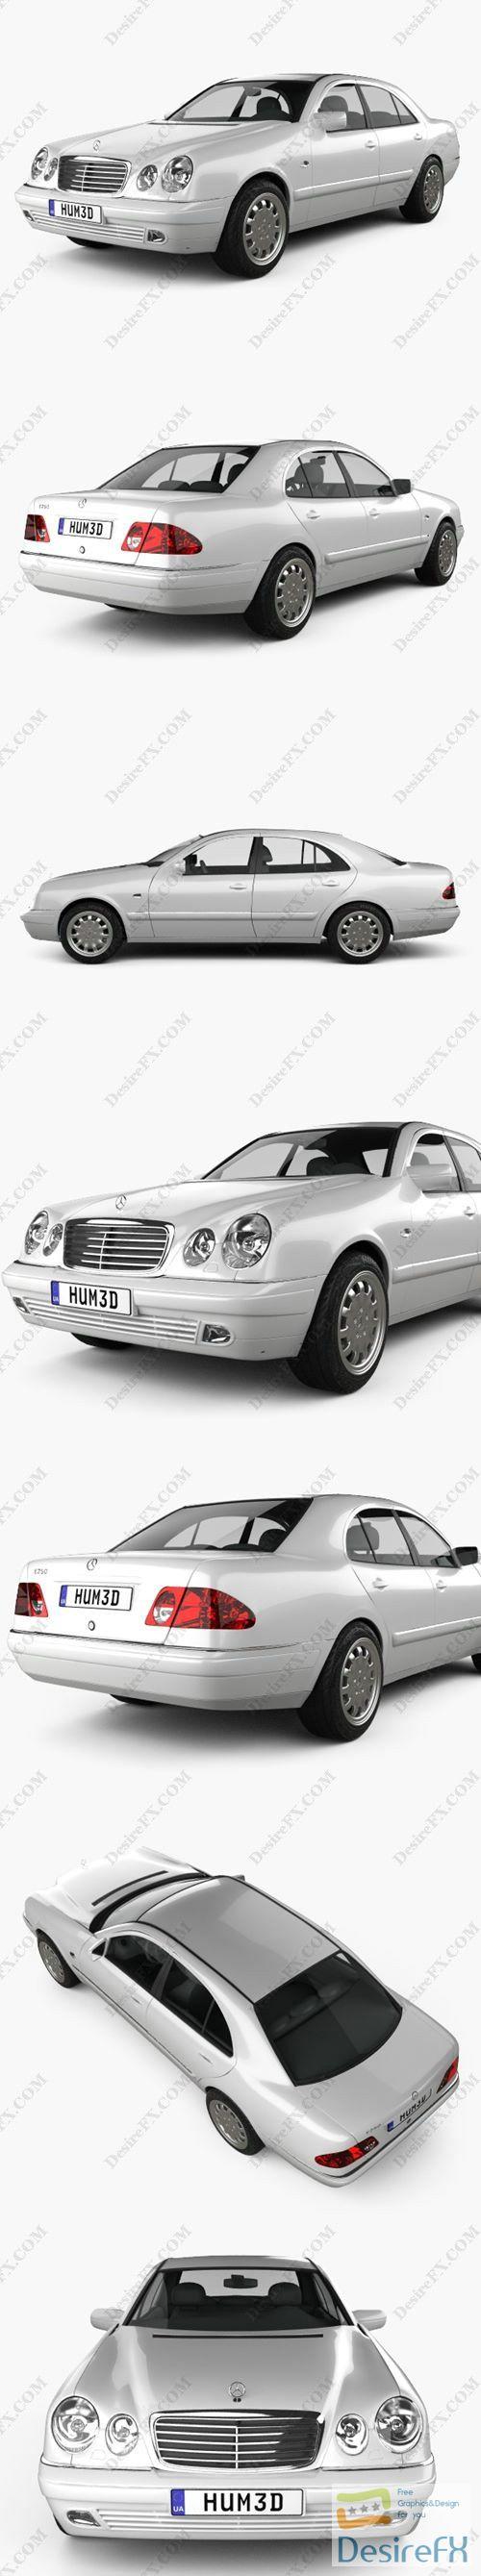 Mercedes-Benz E-Class sedan (W210) 1996 3D Model